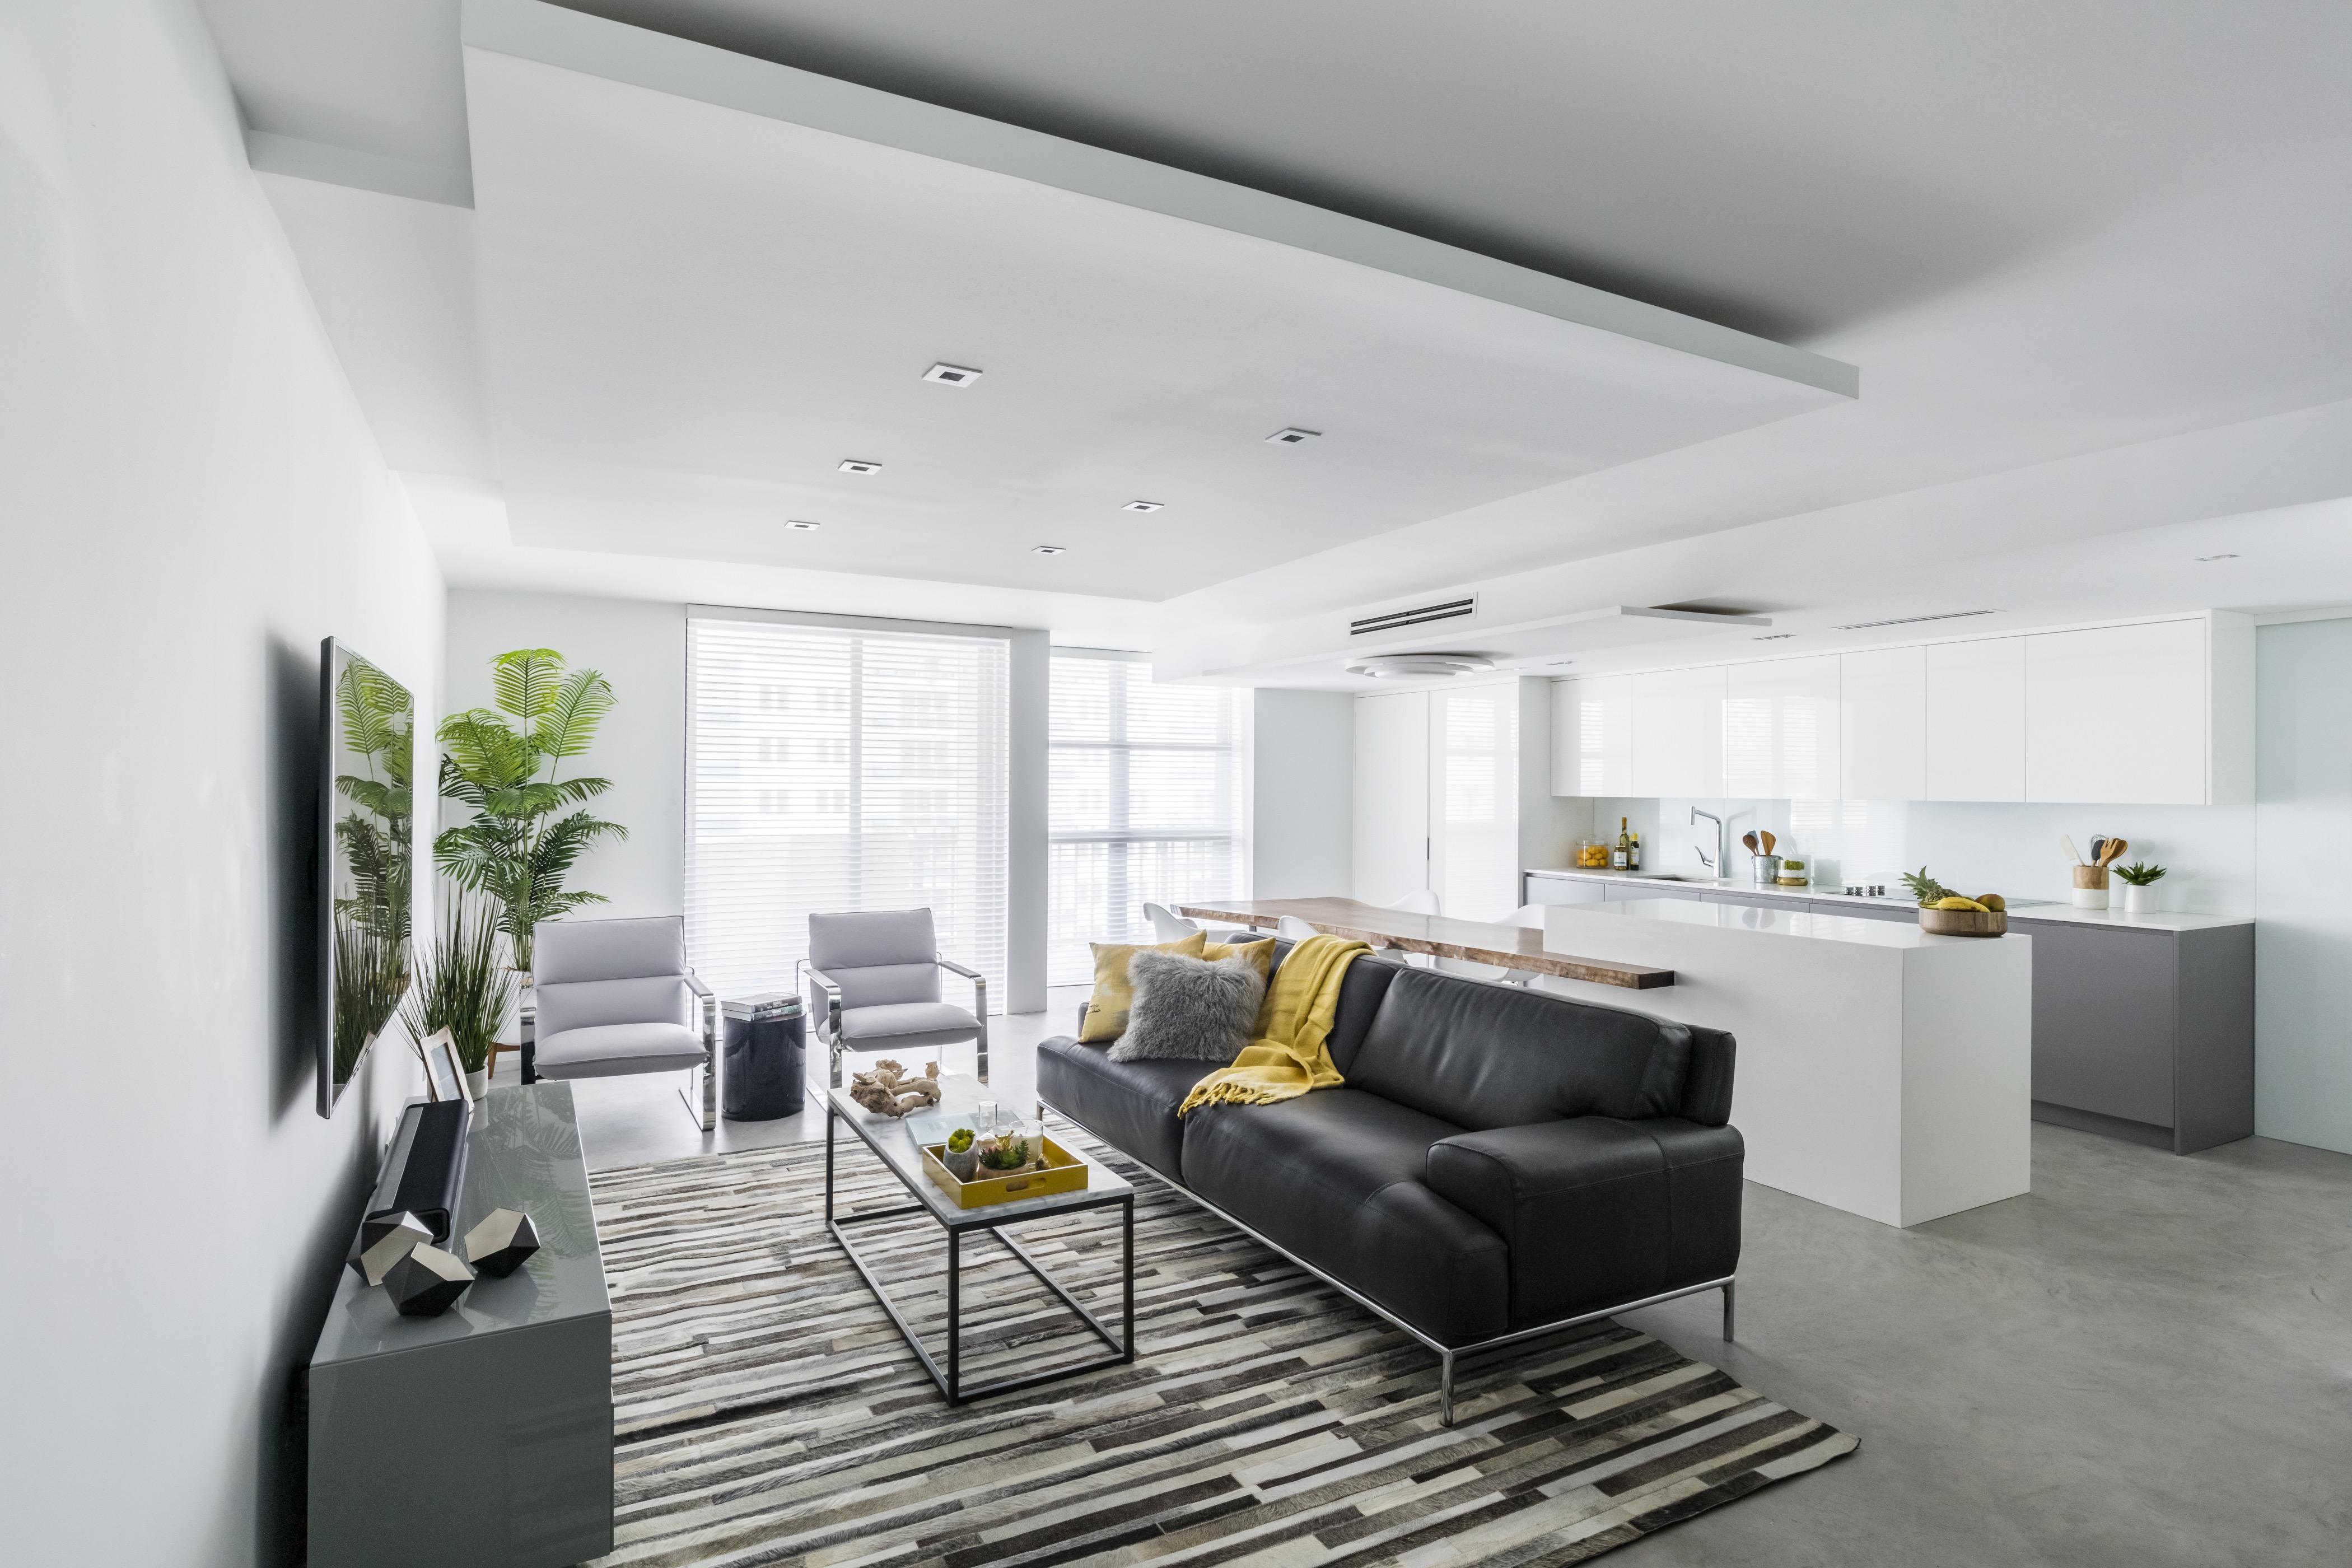 Basic Home Interior Design Principles For Good Appearance